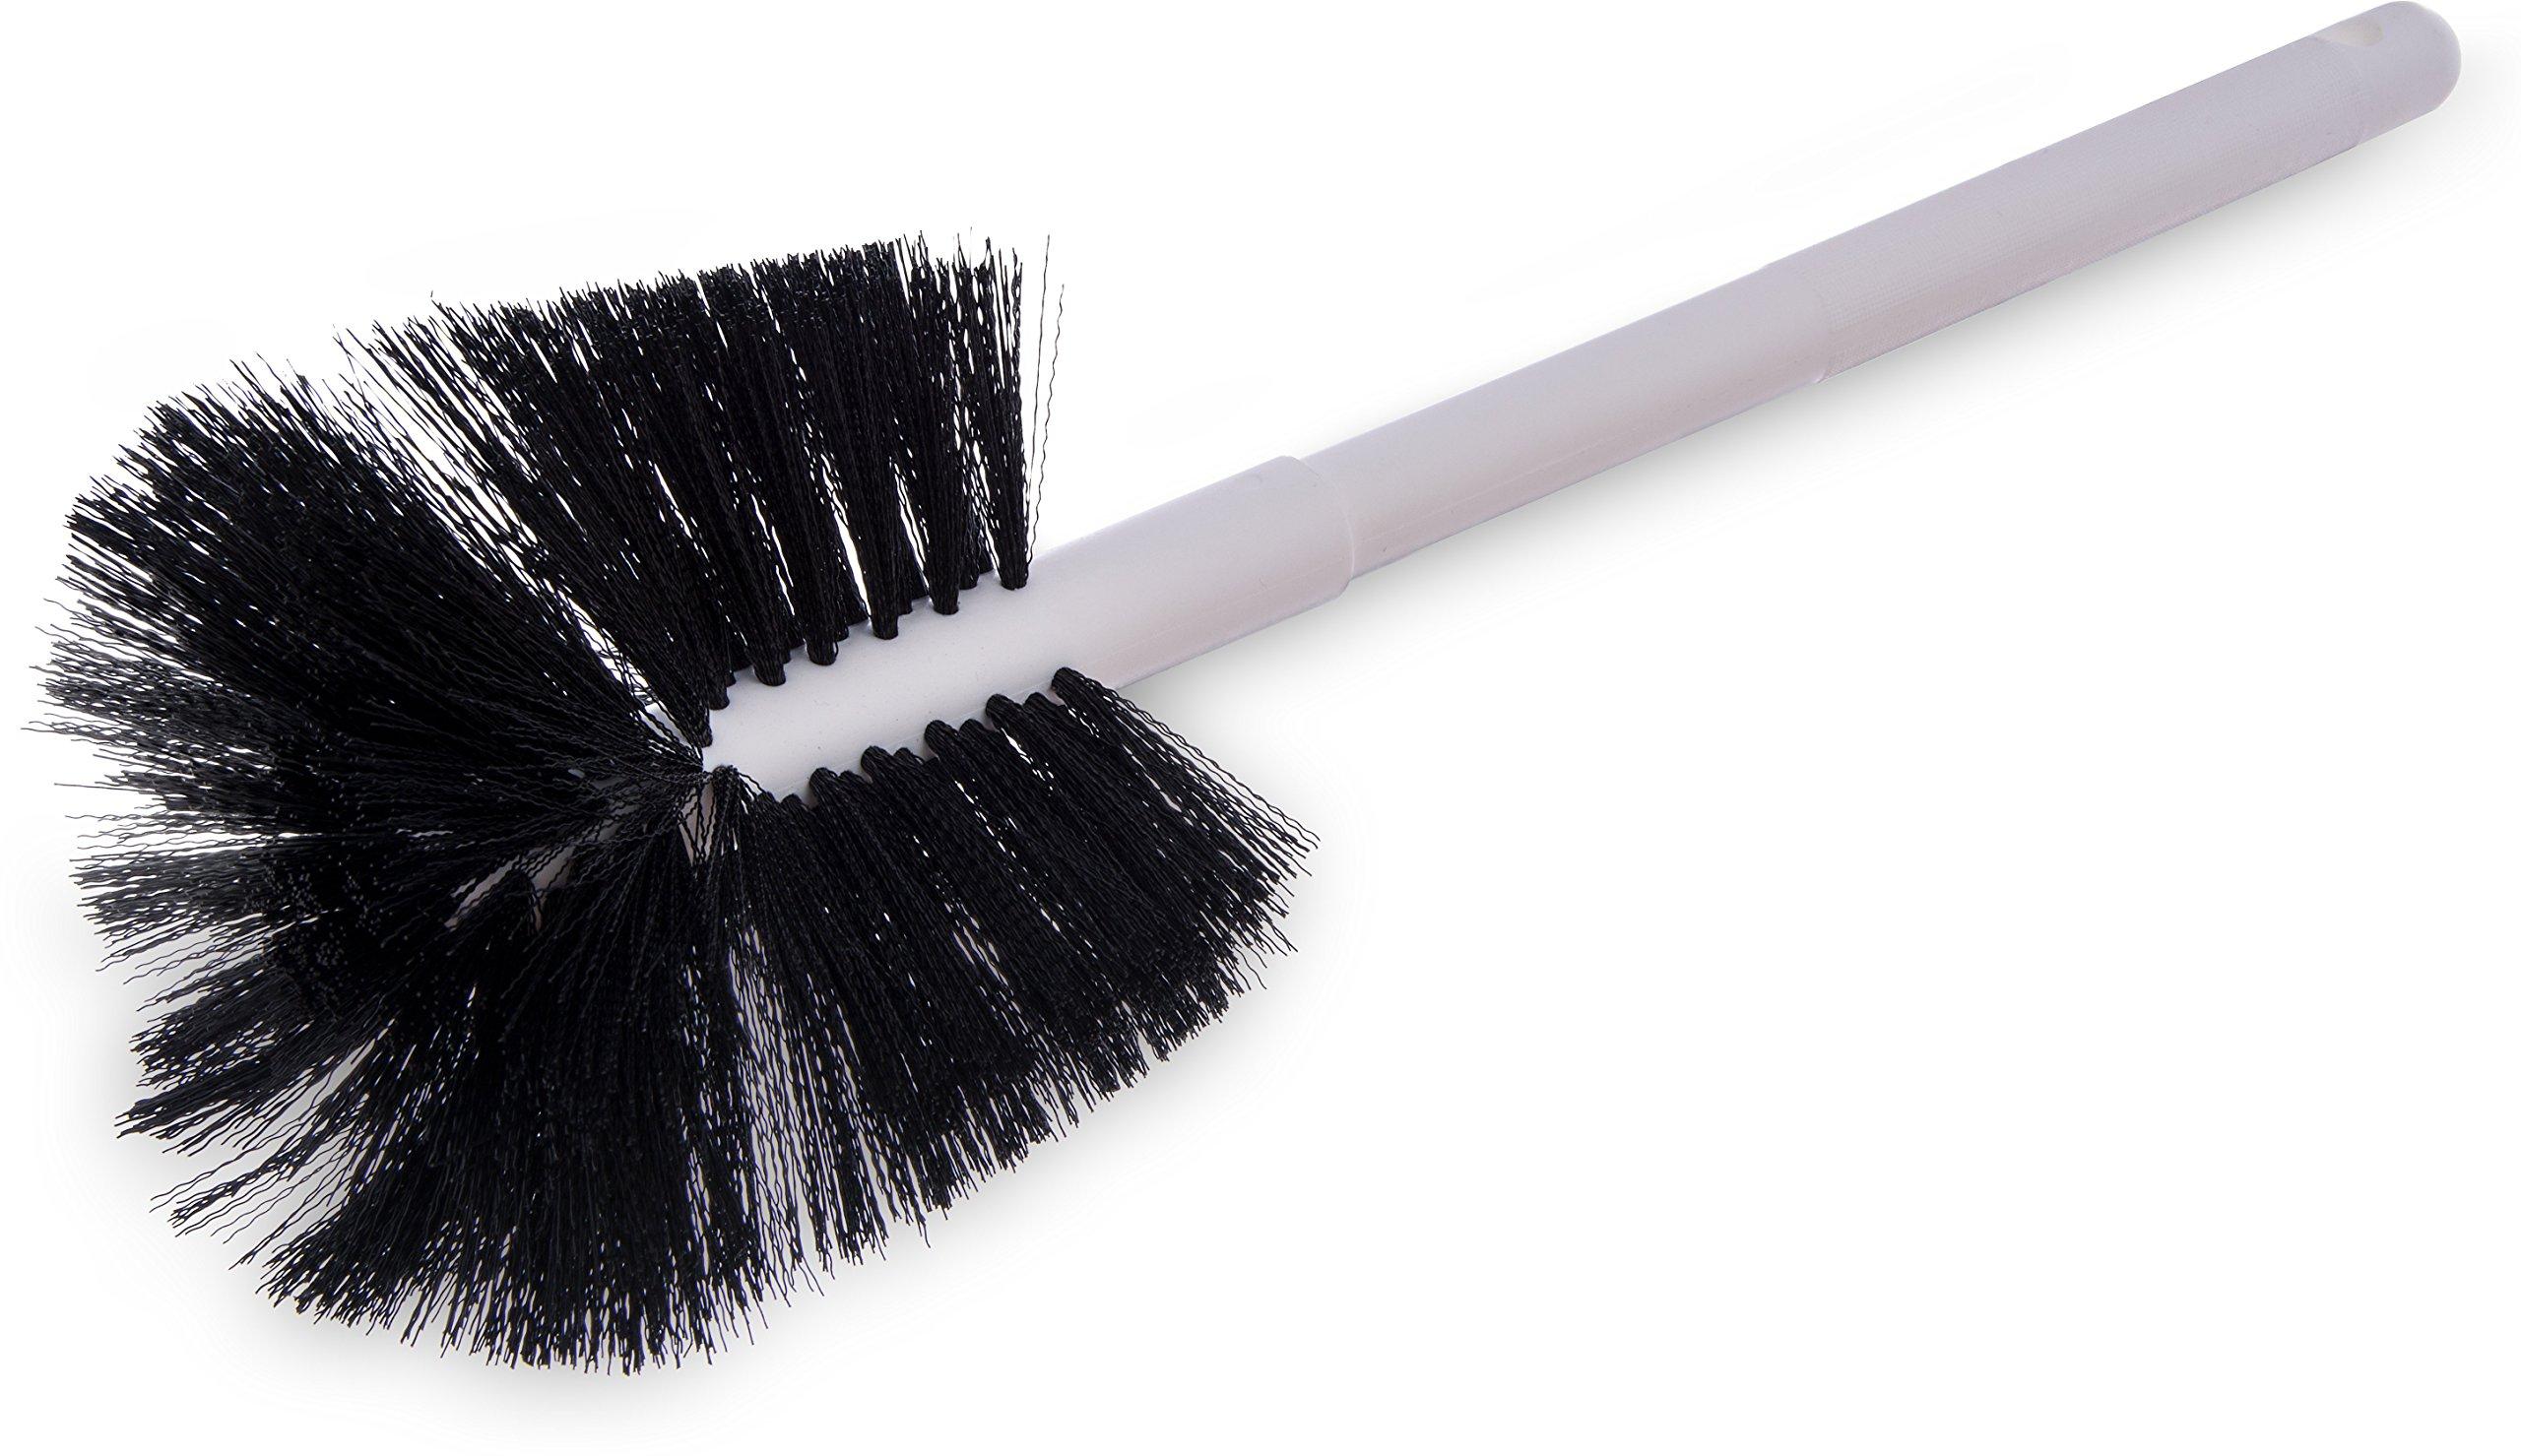 Carlisle 4002500 Sparta Coffee Decanter Brush, Soft Polyester Bristles, 6-1/2'' Bristle Diameter, 4-1/2'' Brush Length, 16'' Overall Length (Pack of 6)